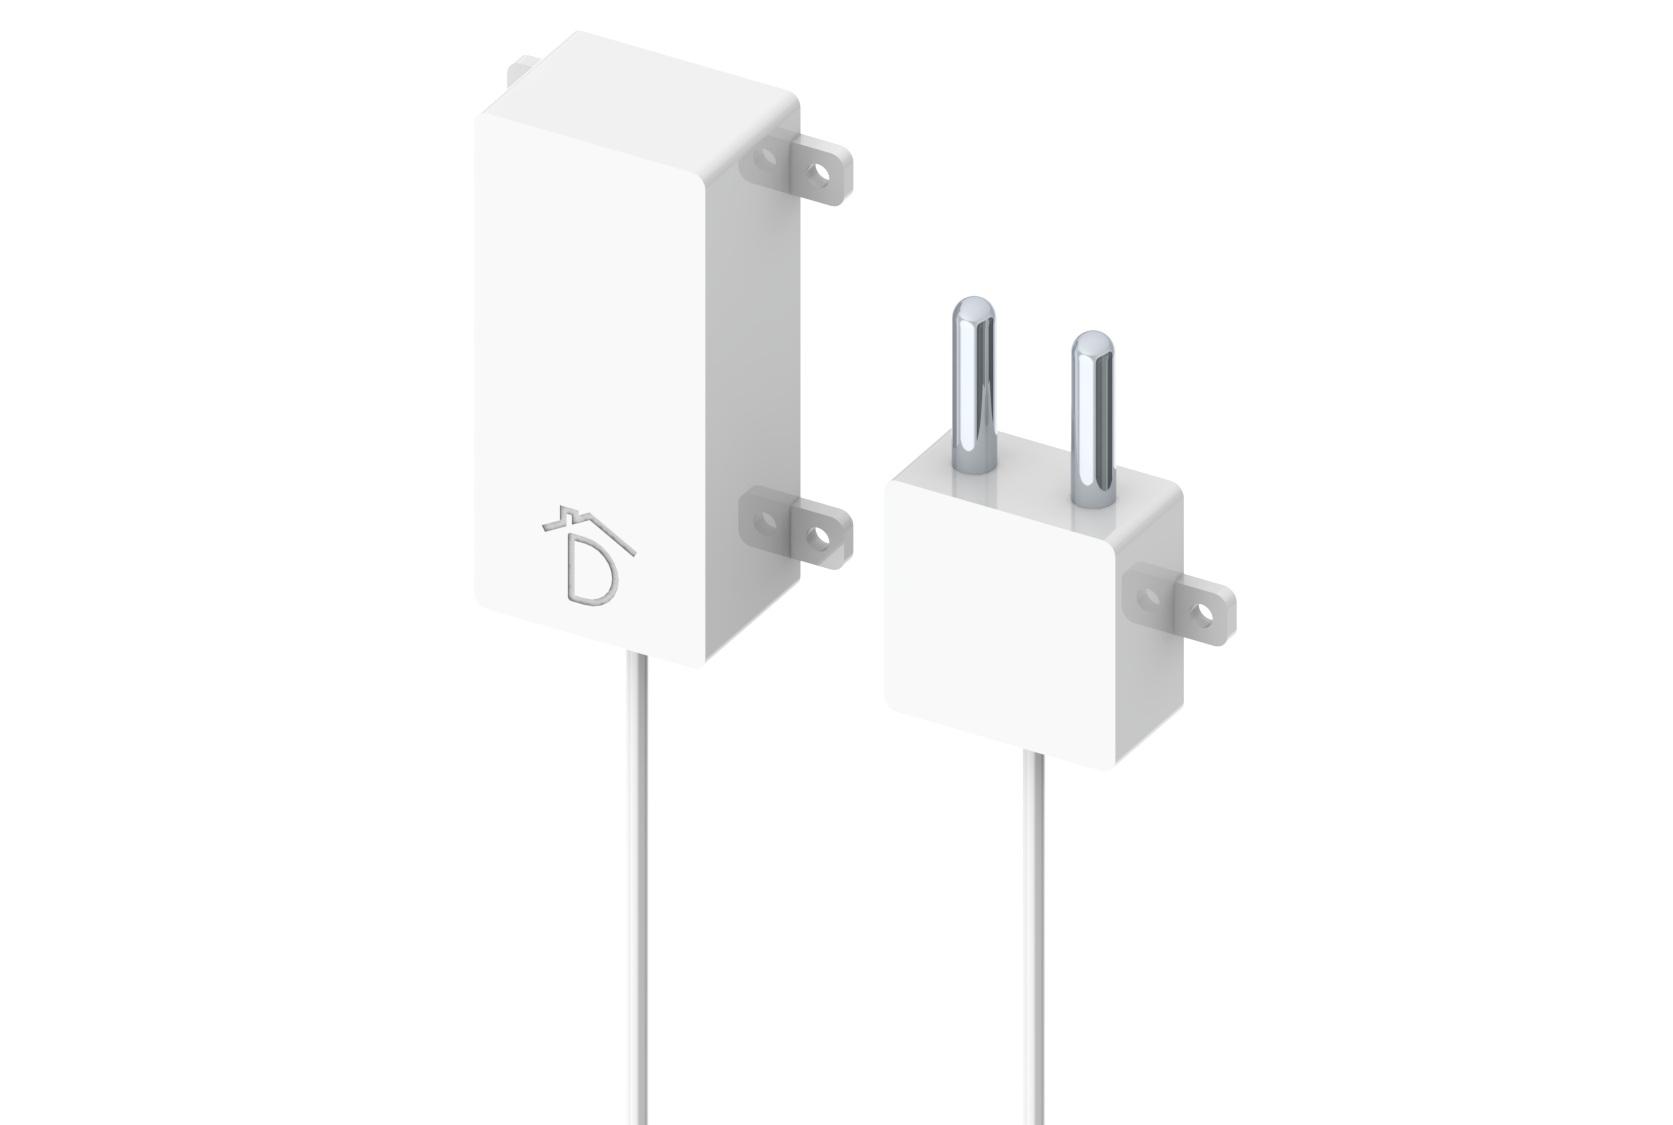 Domatic Moisture Sensor